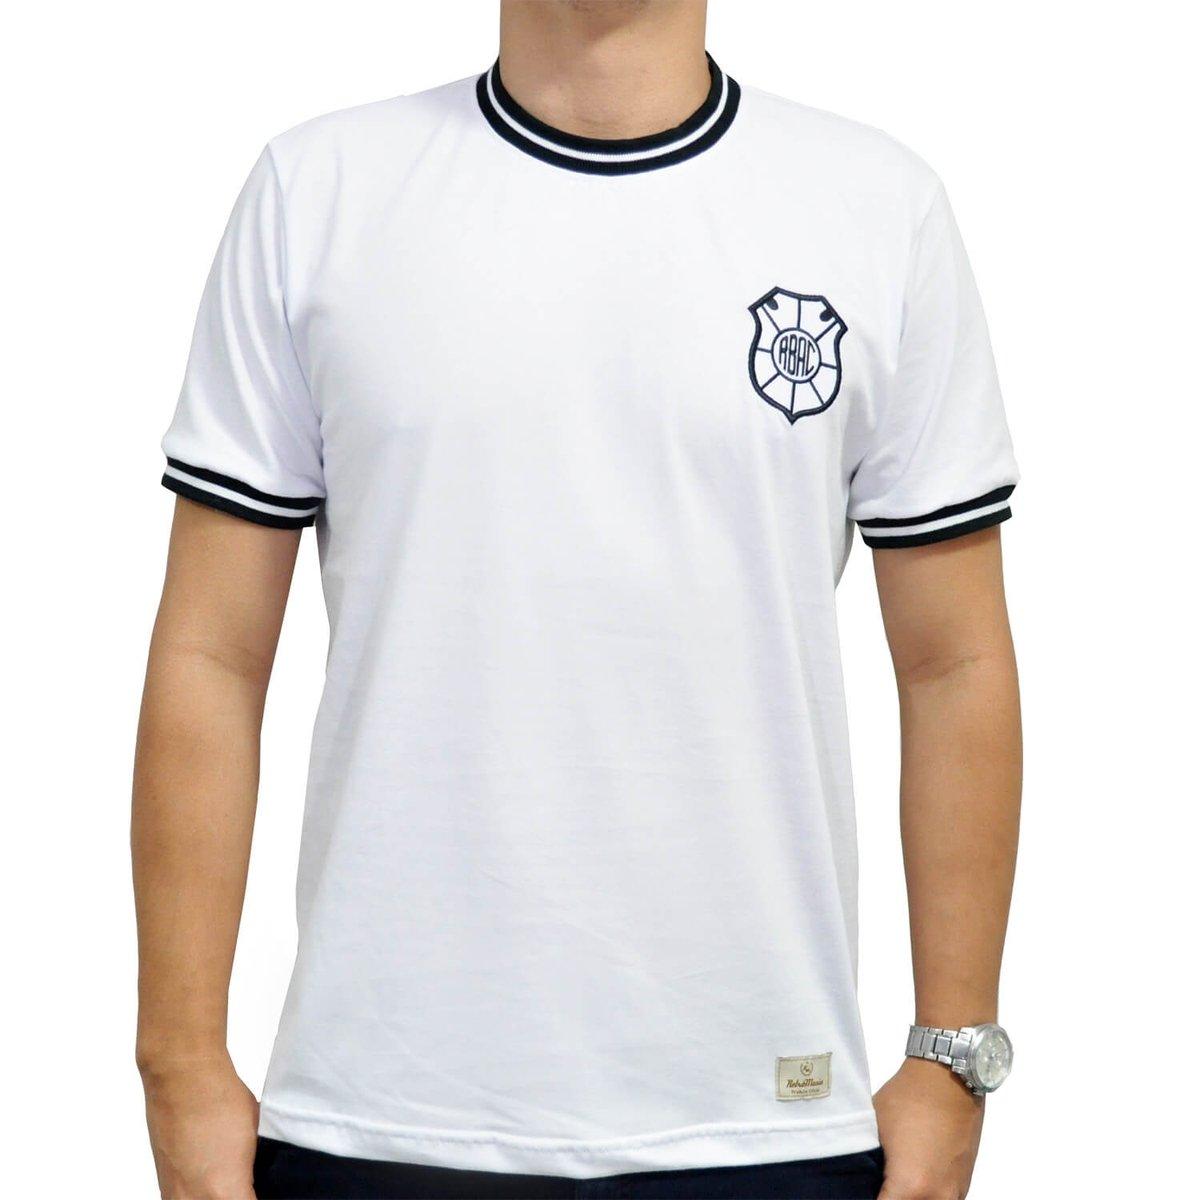 f8883c09b641b Camisa Retrô Mania Rio Branco ES 1983 - Compre Agora